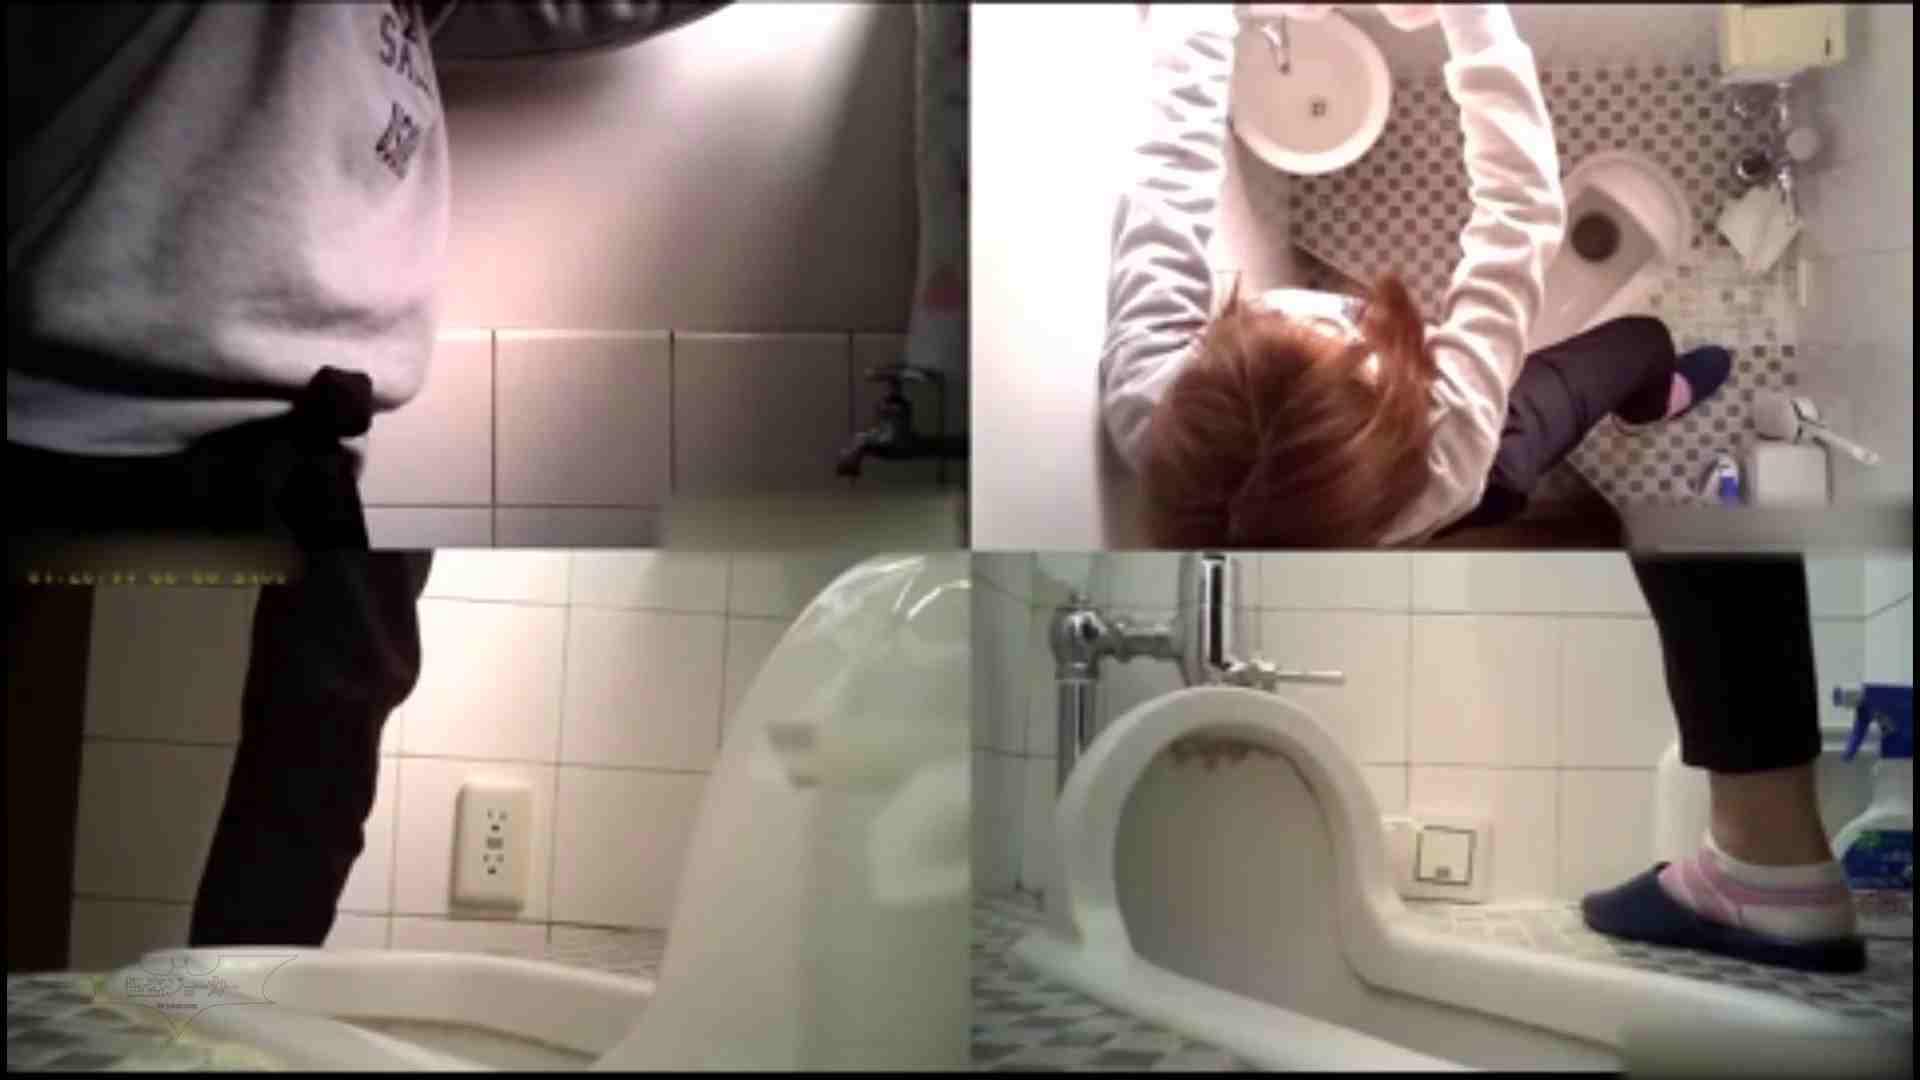 Vol.05 花の女子大生 トイレ恥態 進化系マルチアングル!! ギャル達 エロ無料画像 101枚 66